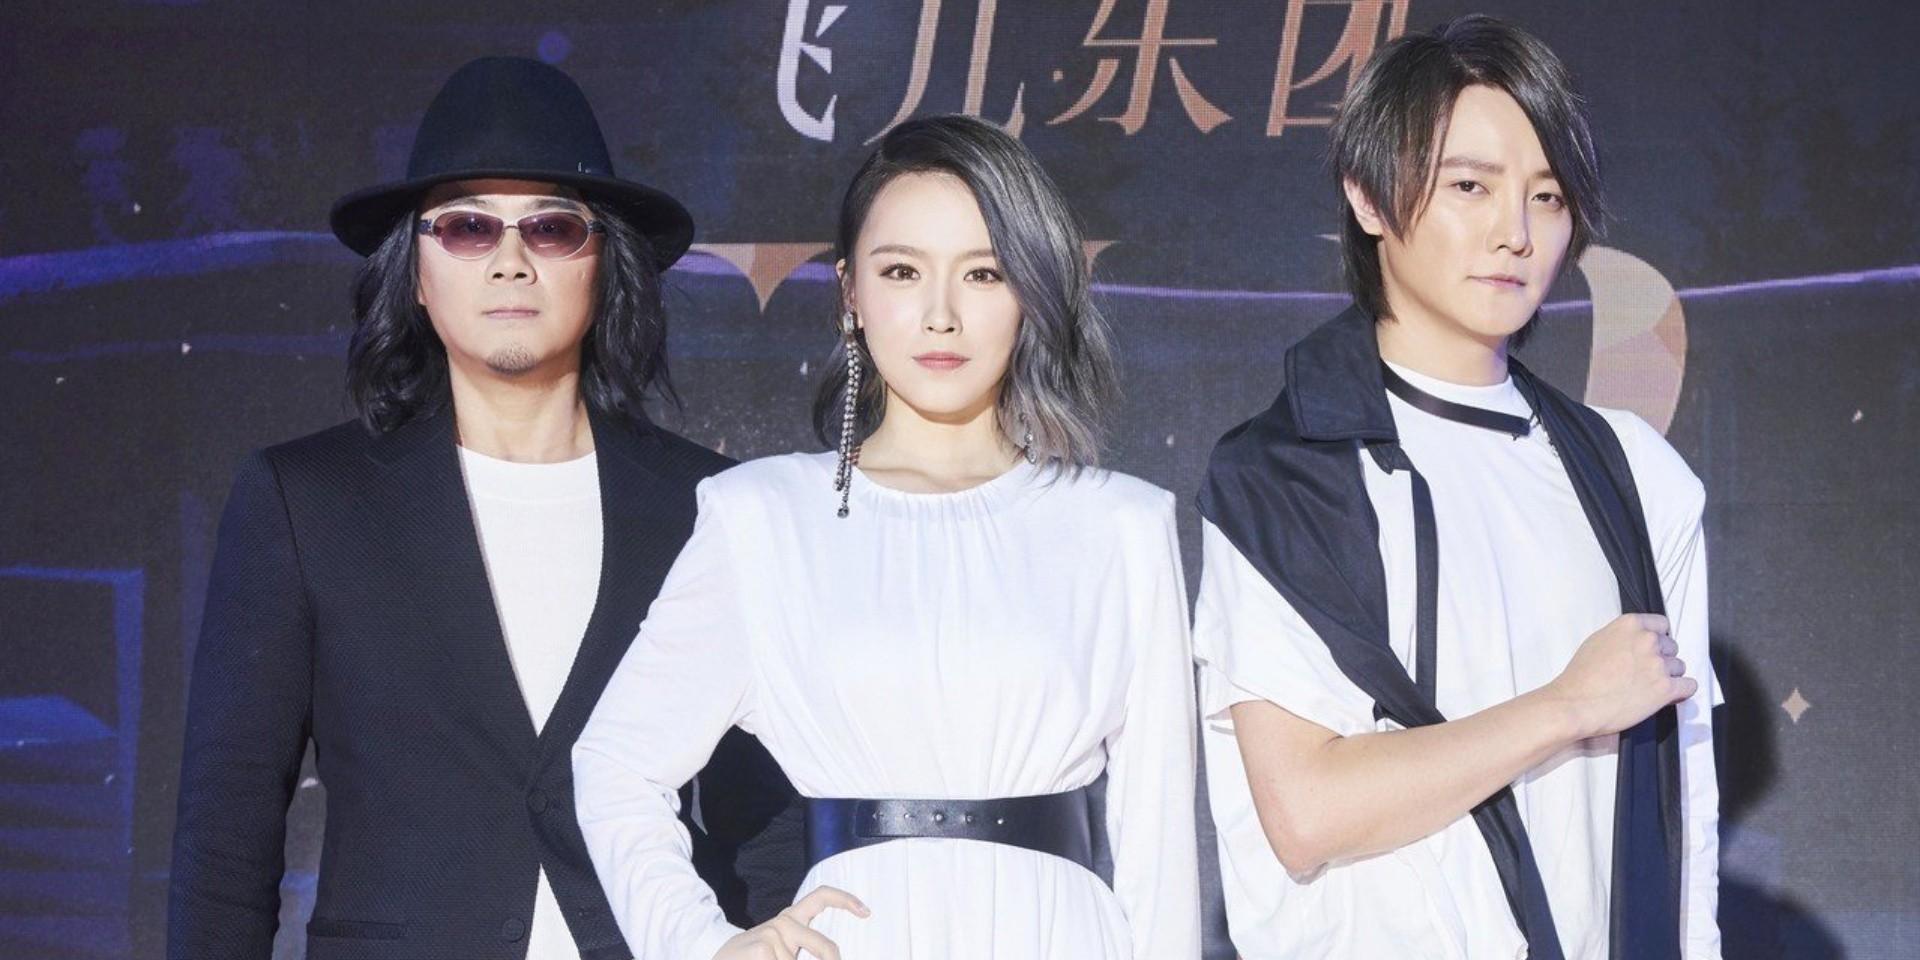 Taiwanese pop rock band F.I.R. to headline Stärker Music Carnival 2019